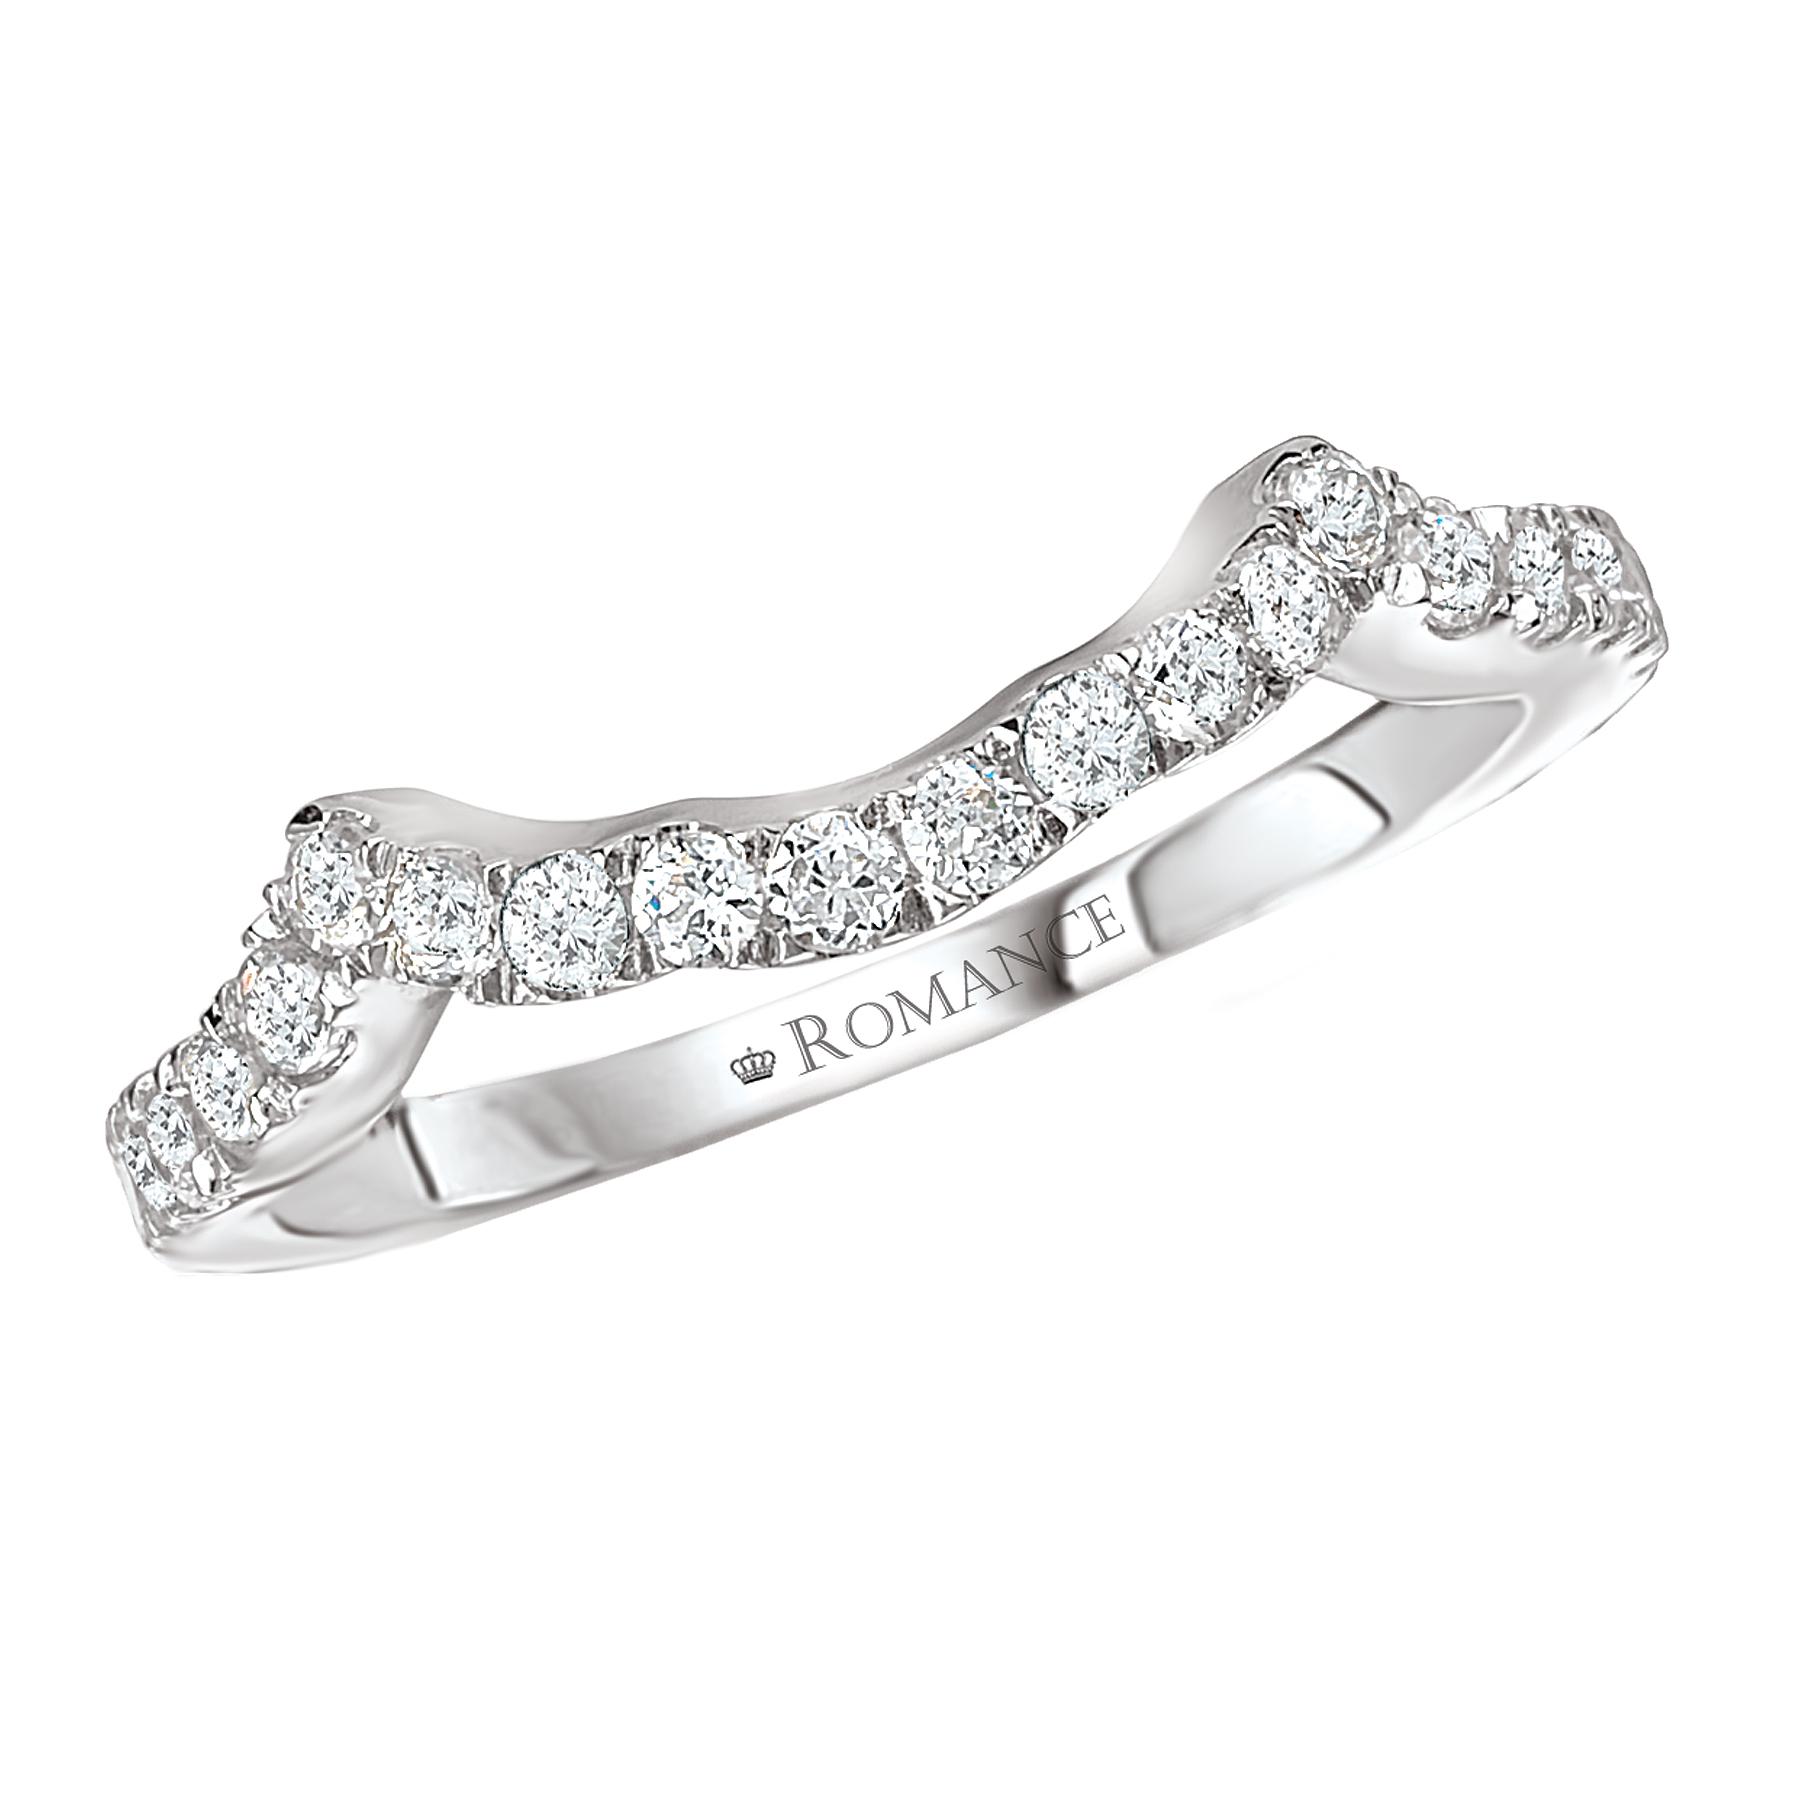 Romance Wedding Bands 117334-W product image